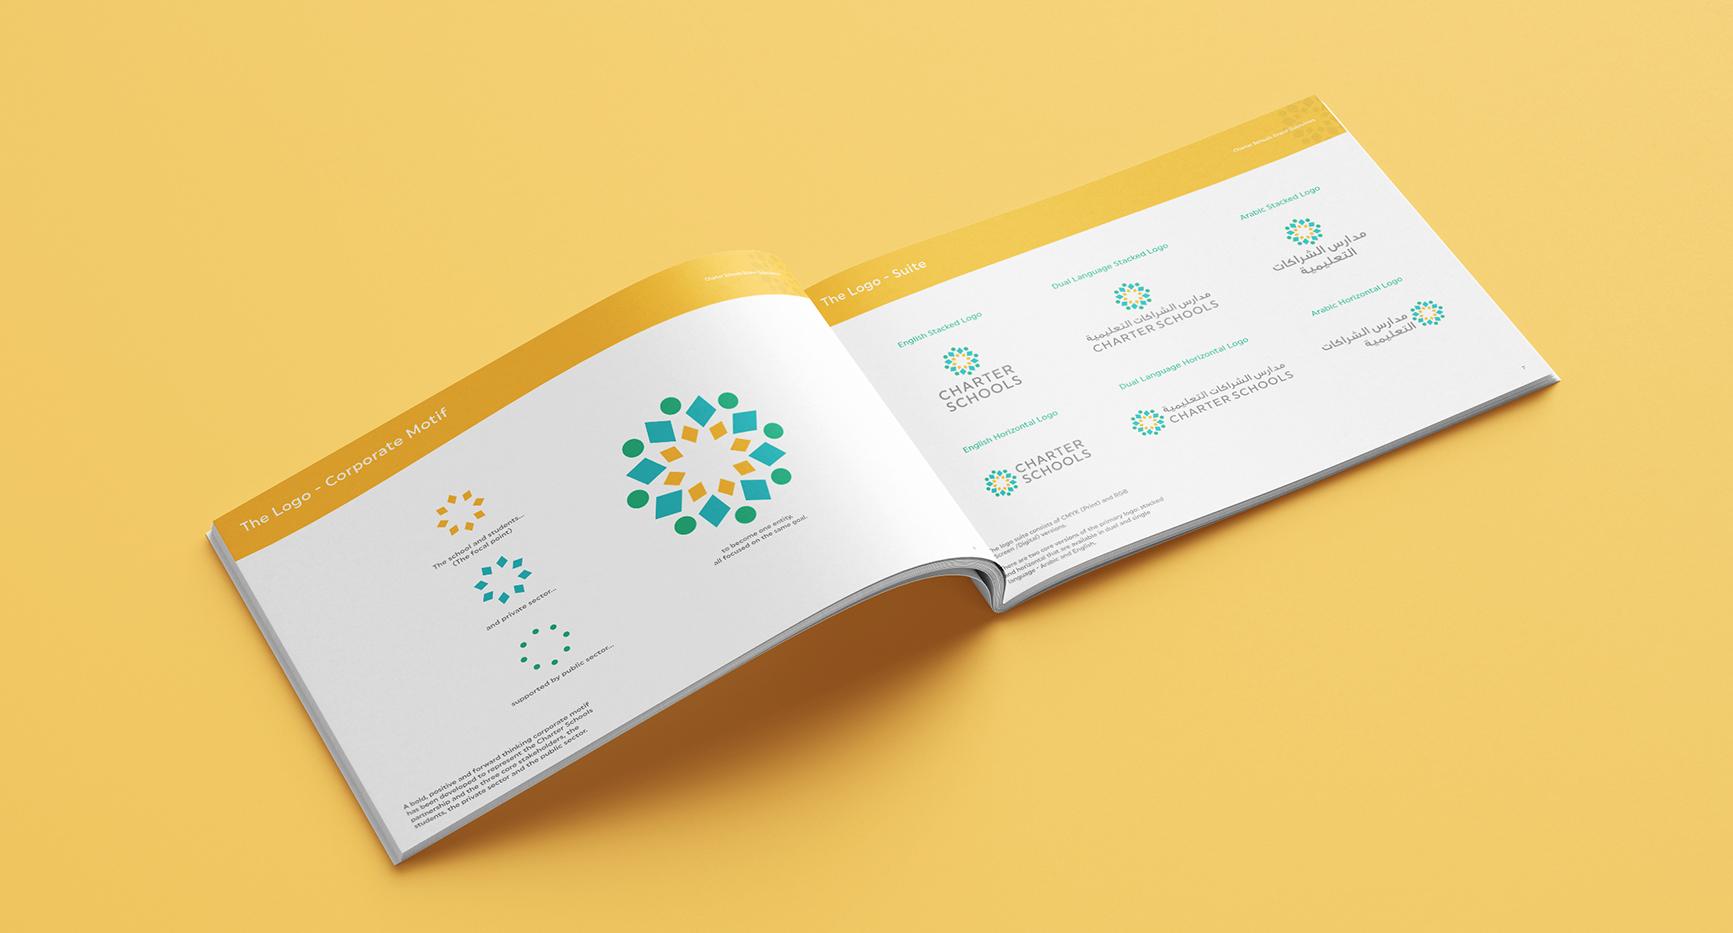 Charter-Schools-Graphic-Design-1